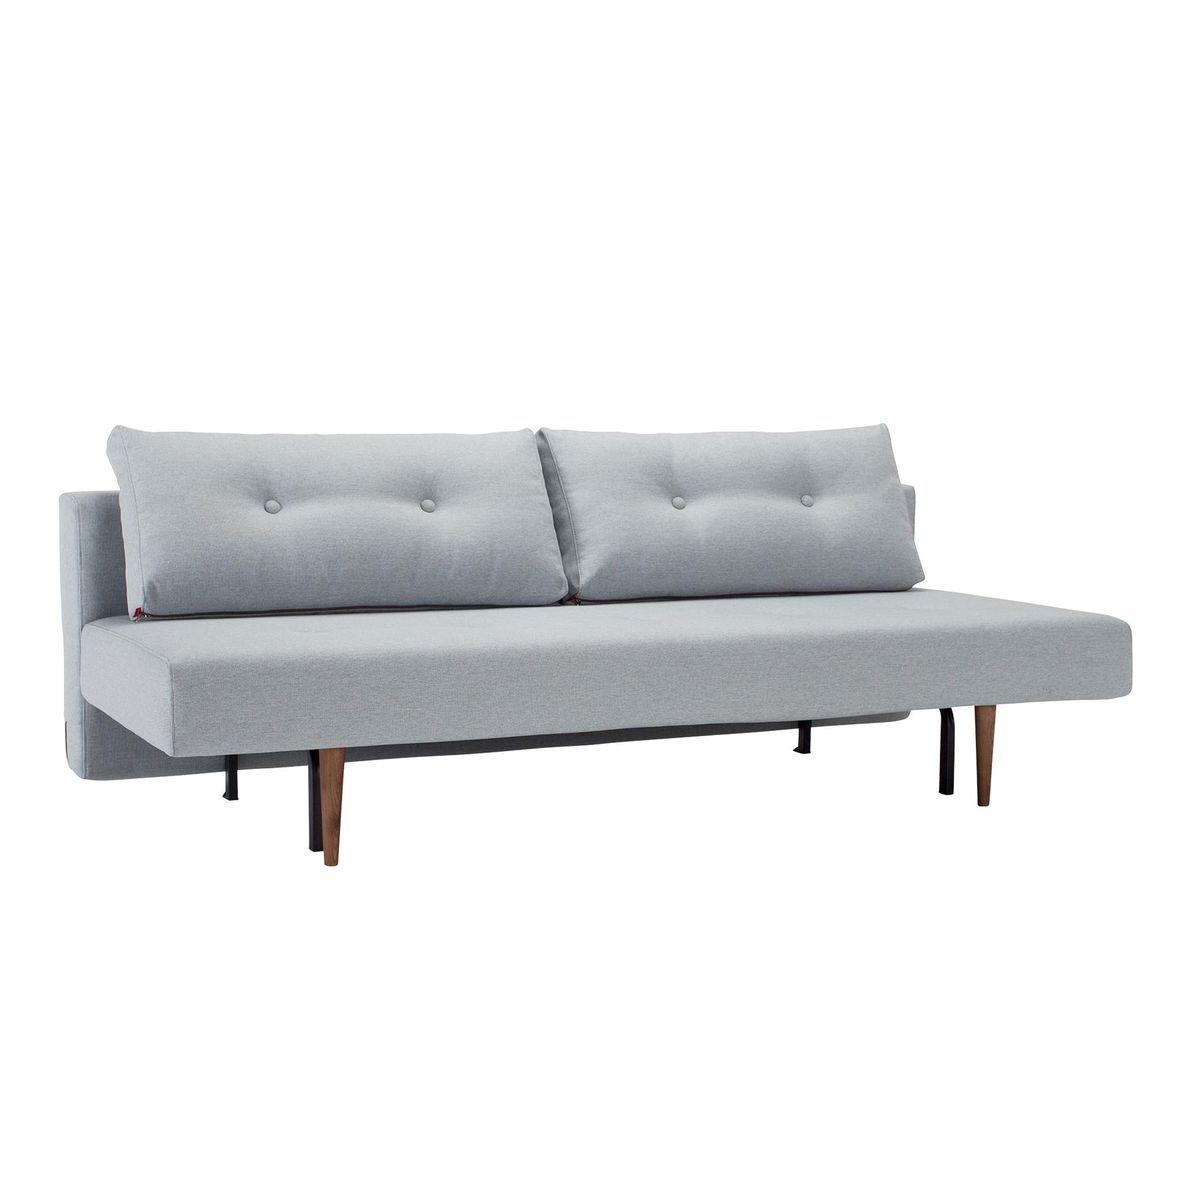 Recast sofa bed innovation for Futon schlafsofa